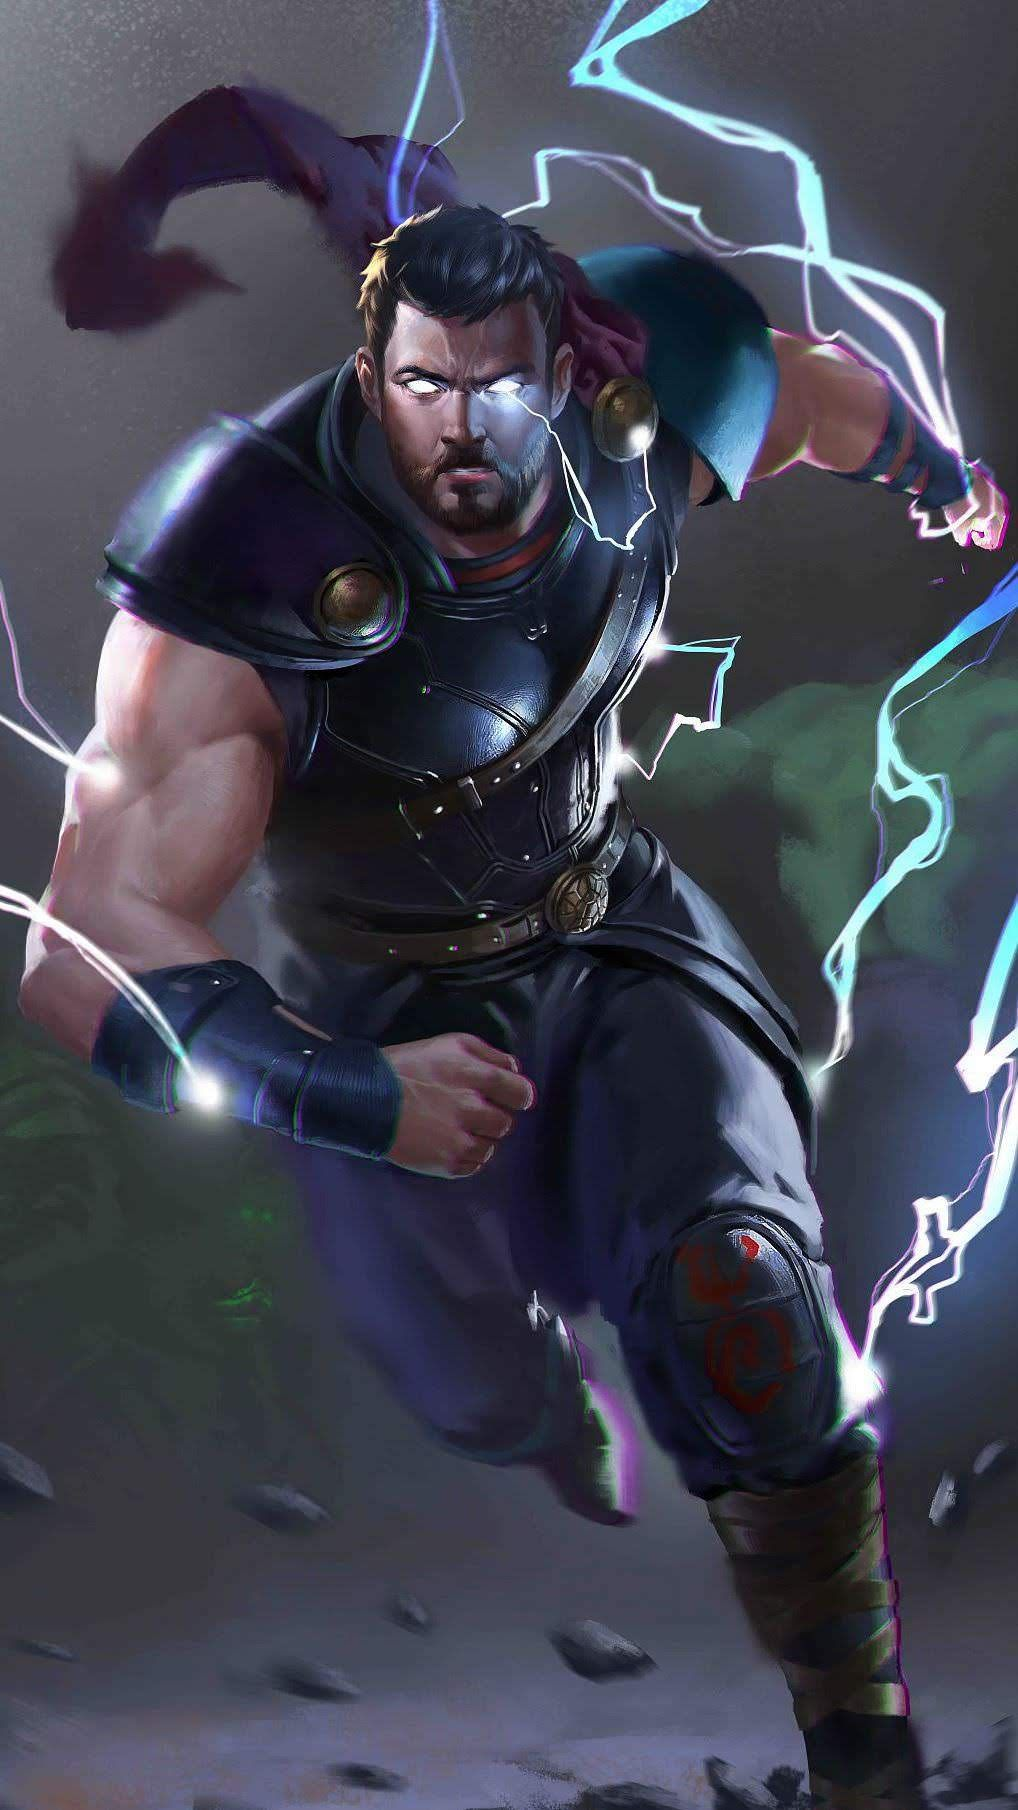 Thor Iphone Wallpaper Download Marvel Thor Marvel Superheroes Thor Wallpaper